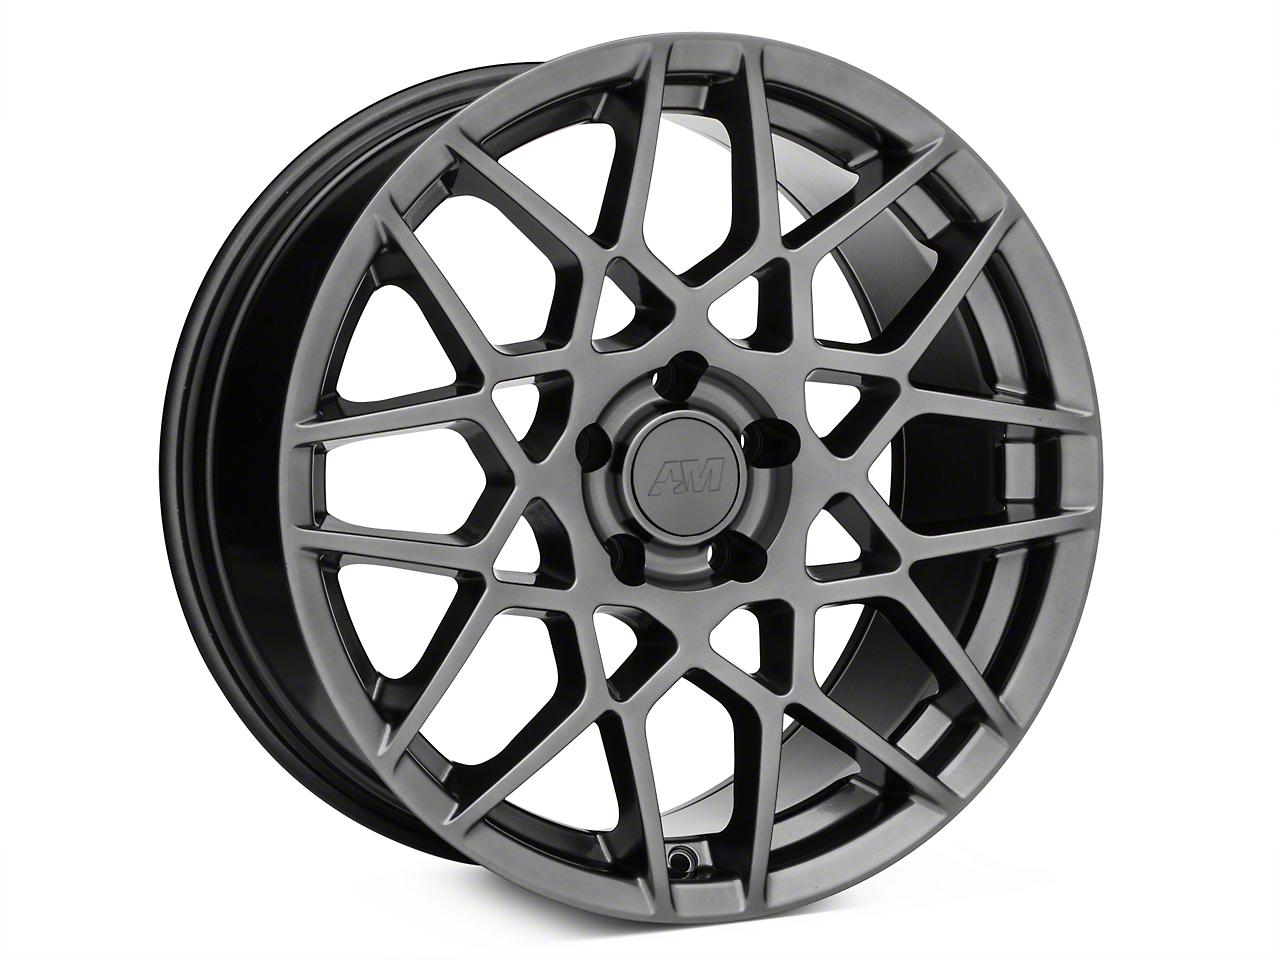 2013 GT500 Style Hyper Dark Wheel - 18x9 (15-17 All)